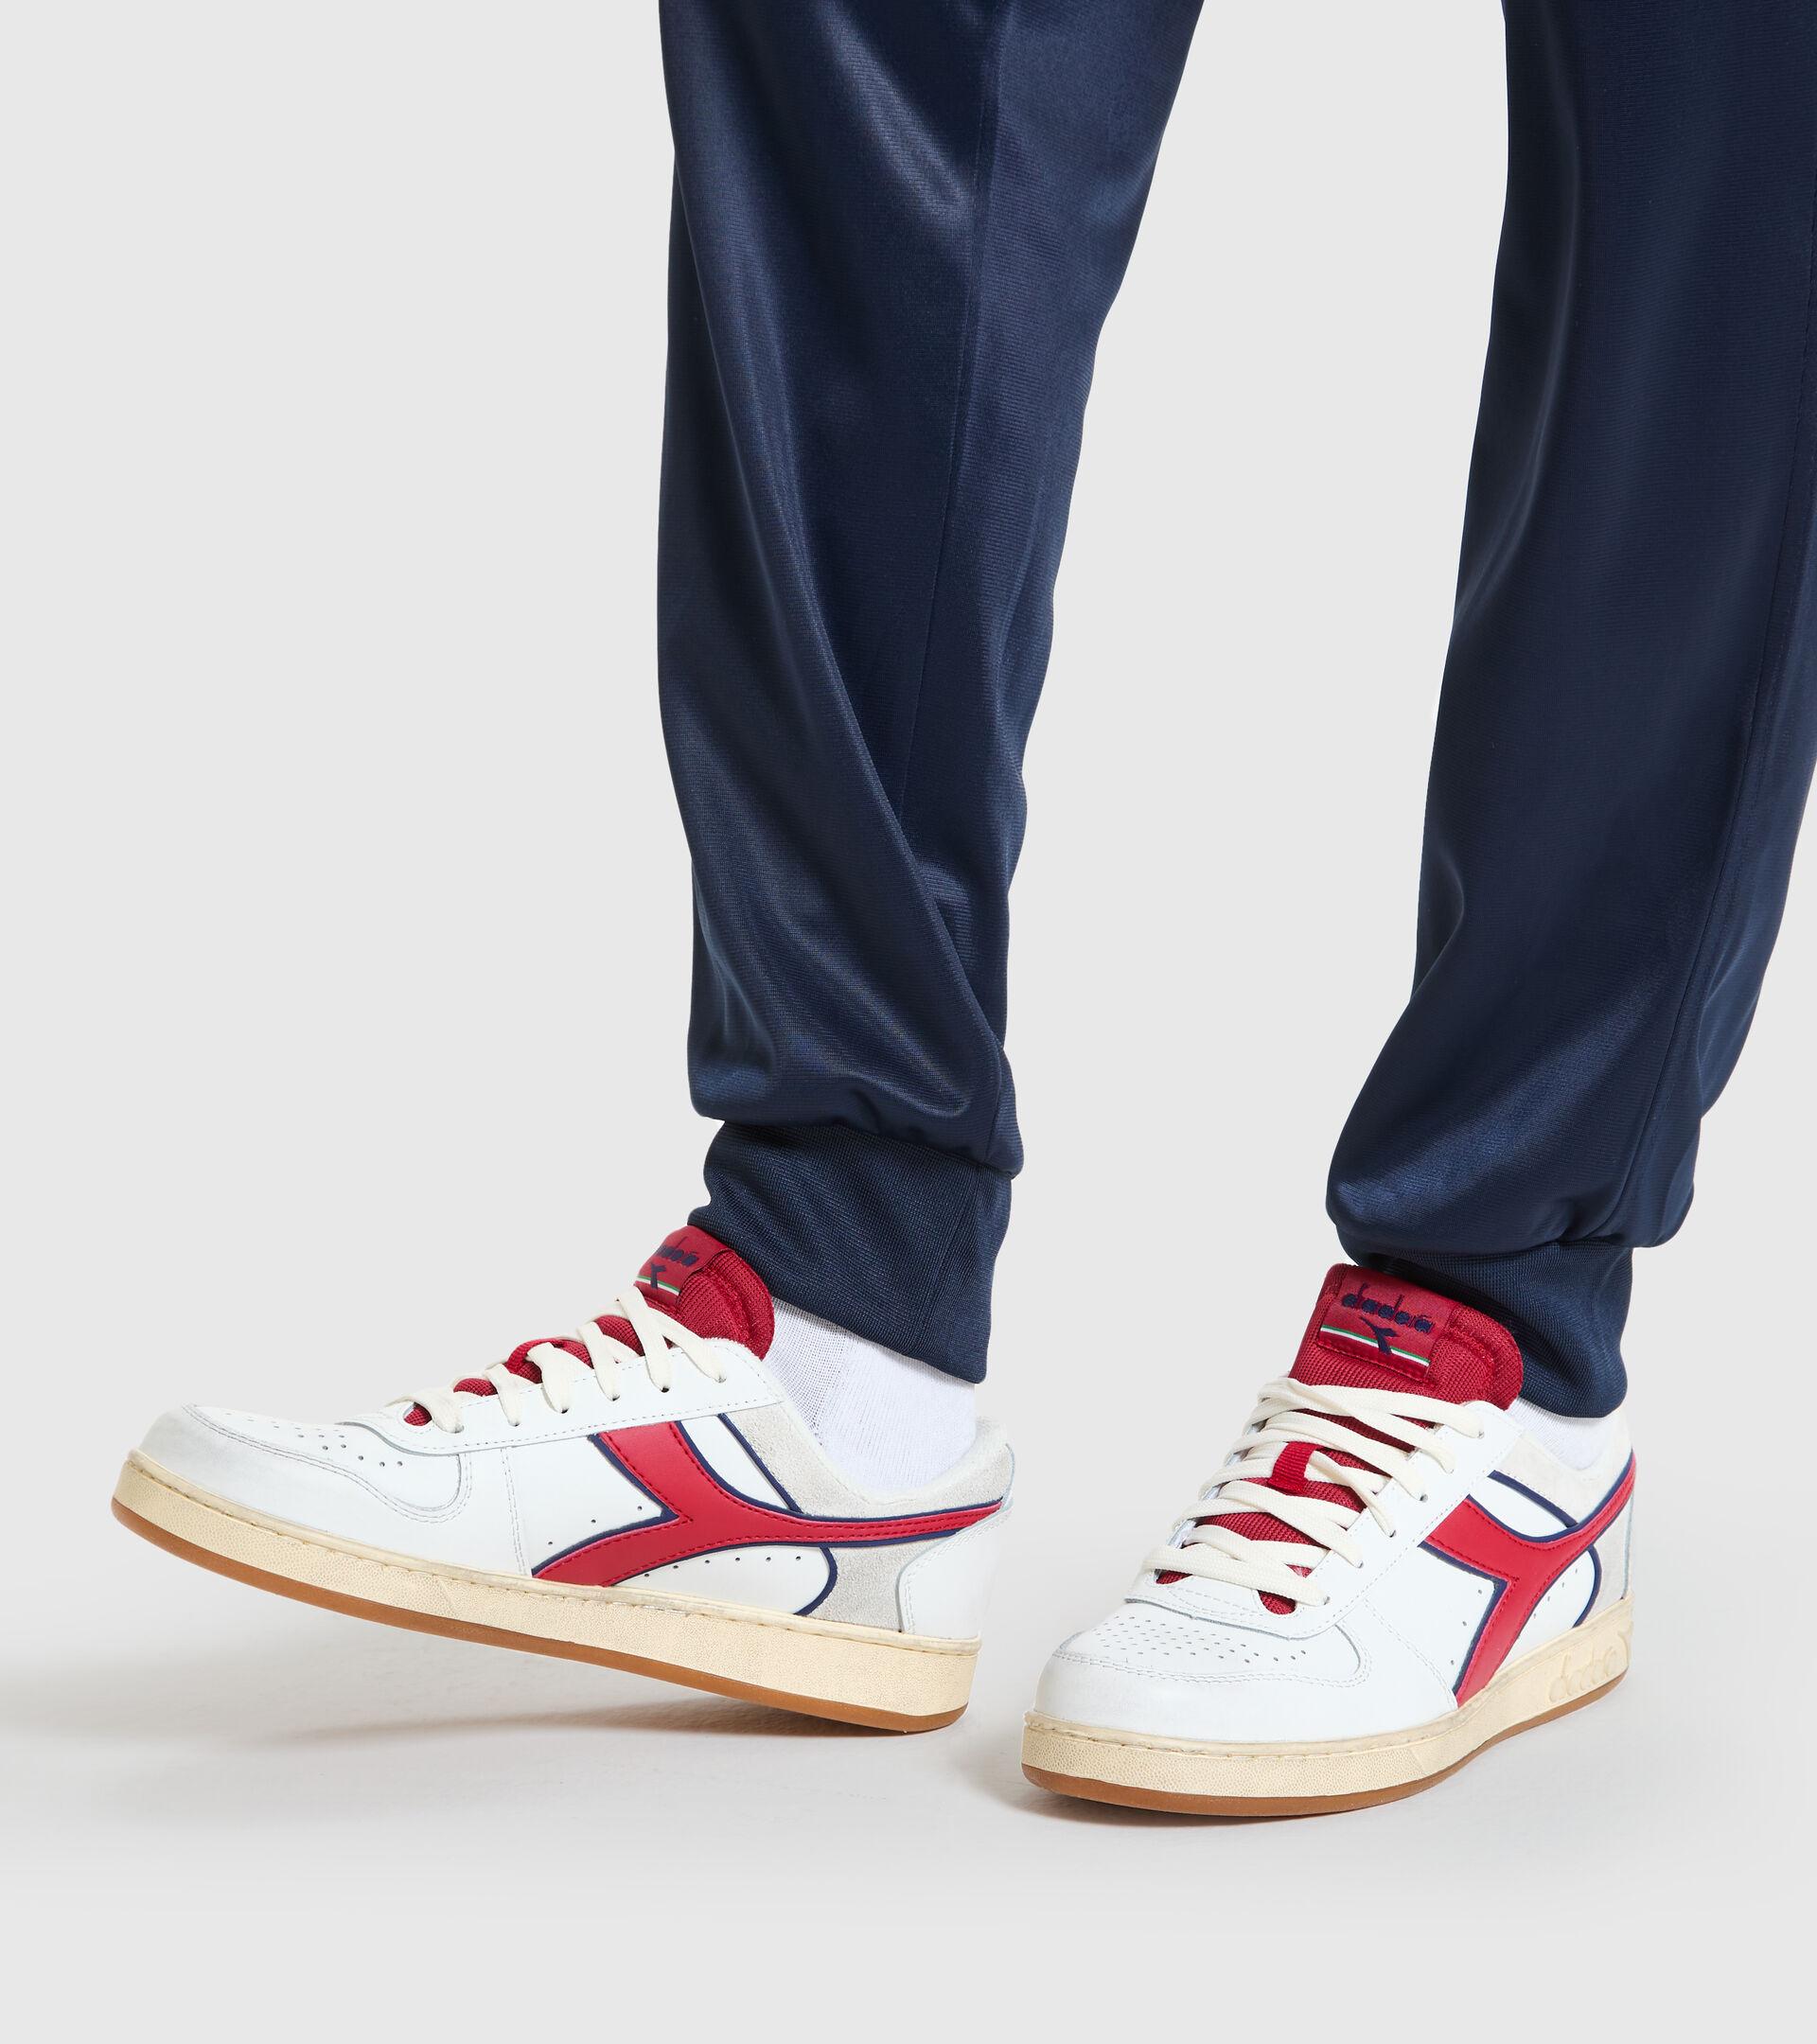 Zapatillas deportivas - Unisex MAGIC BASKET LOW ICONA BLANCO/NARANJA.COM - Diadora